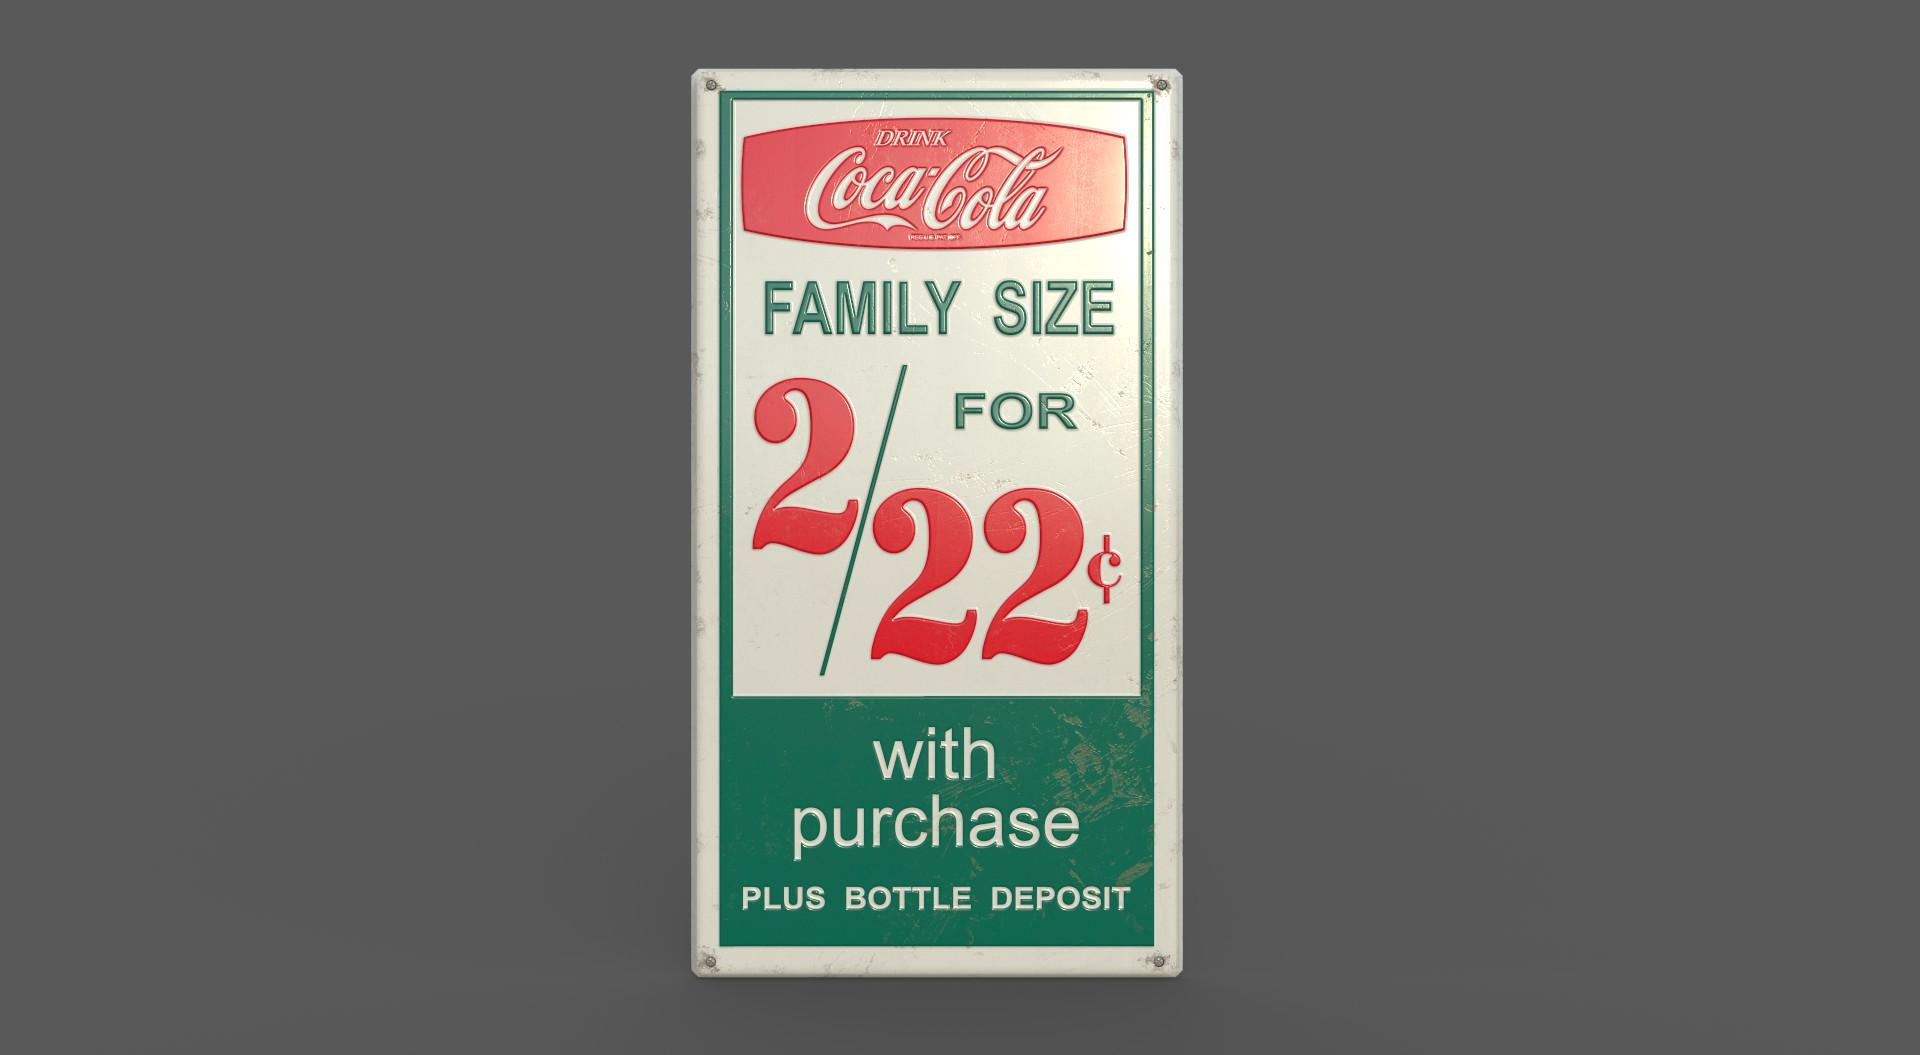 CocaColaSign_2.jpg